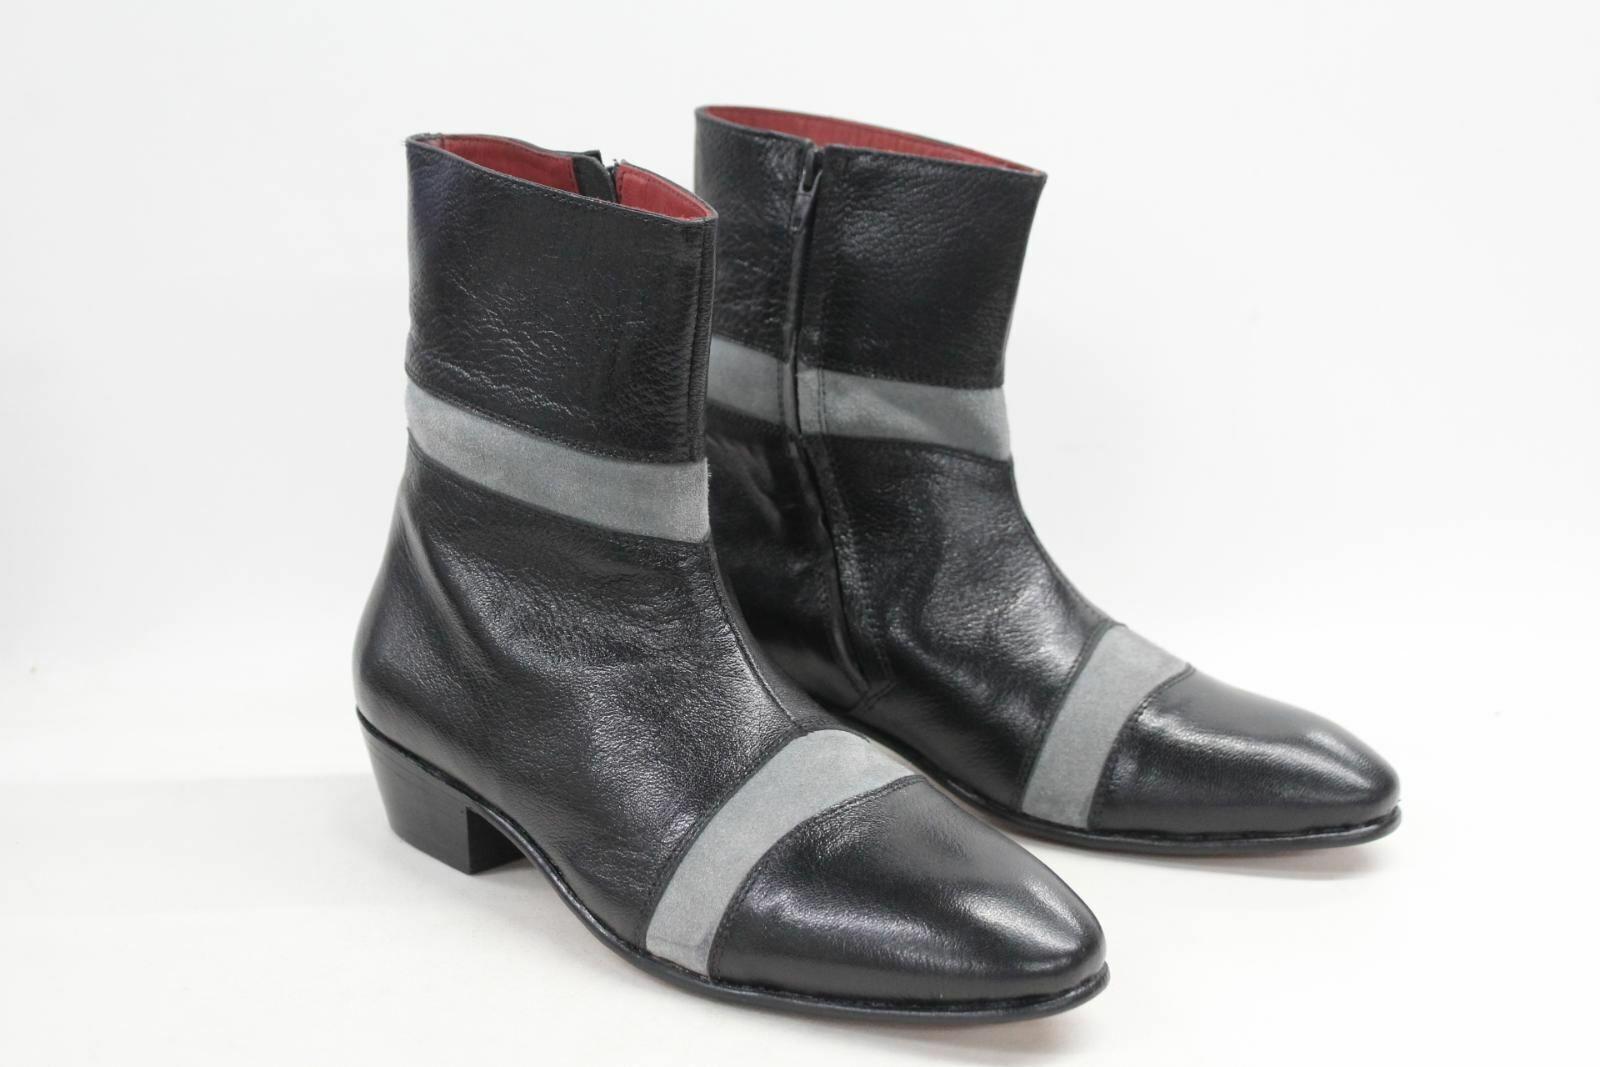 DISTINCT ADVANTAGE Men's Superior Black Leather Pull On Ankle Boots UK7 BNIB